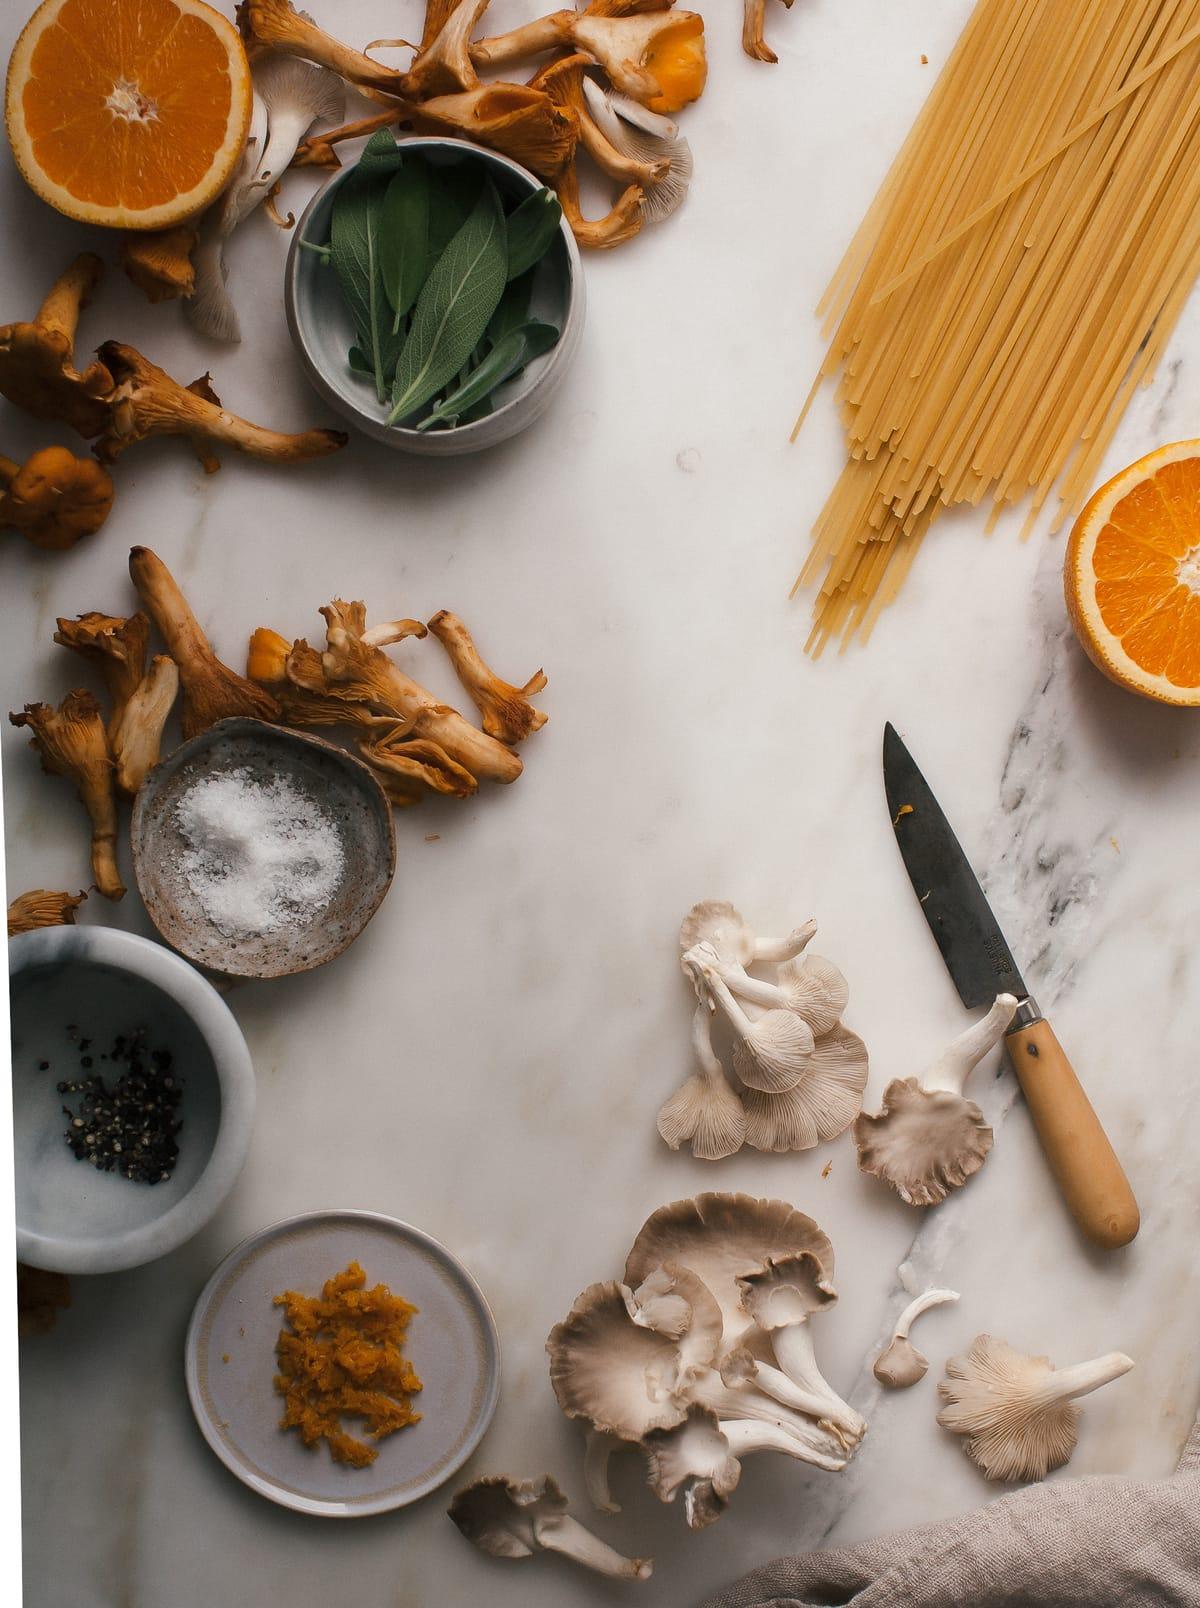 Wild Mushroom Spaghetti with Orange Brown Butter + Crispy Sage